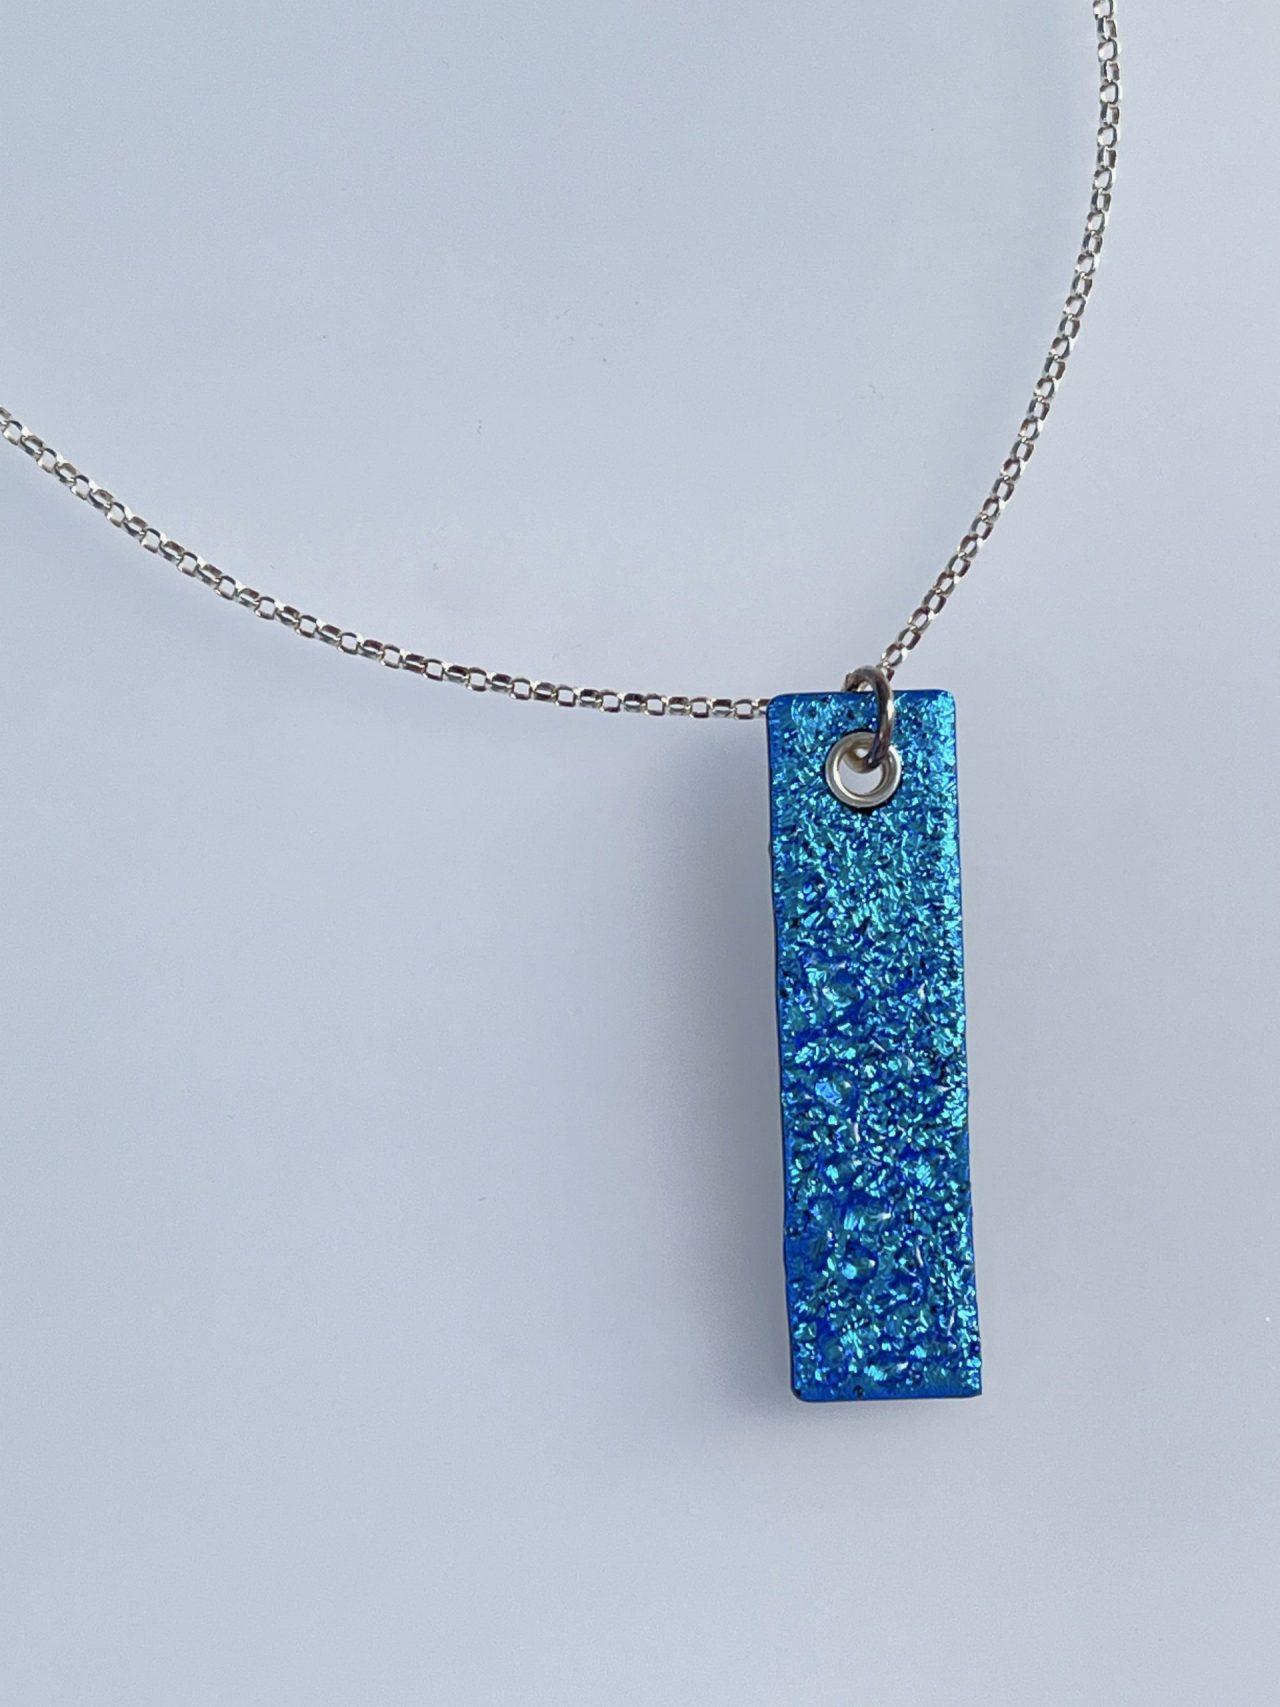 Gift shop – Aquamarine pendant front